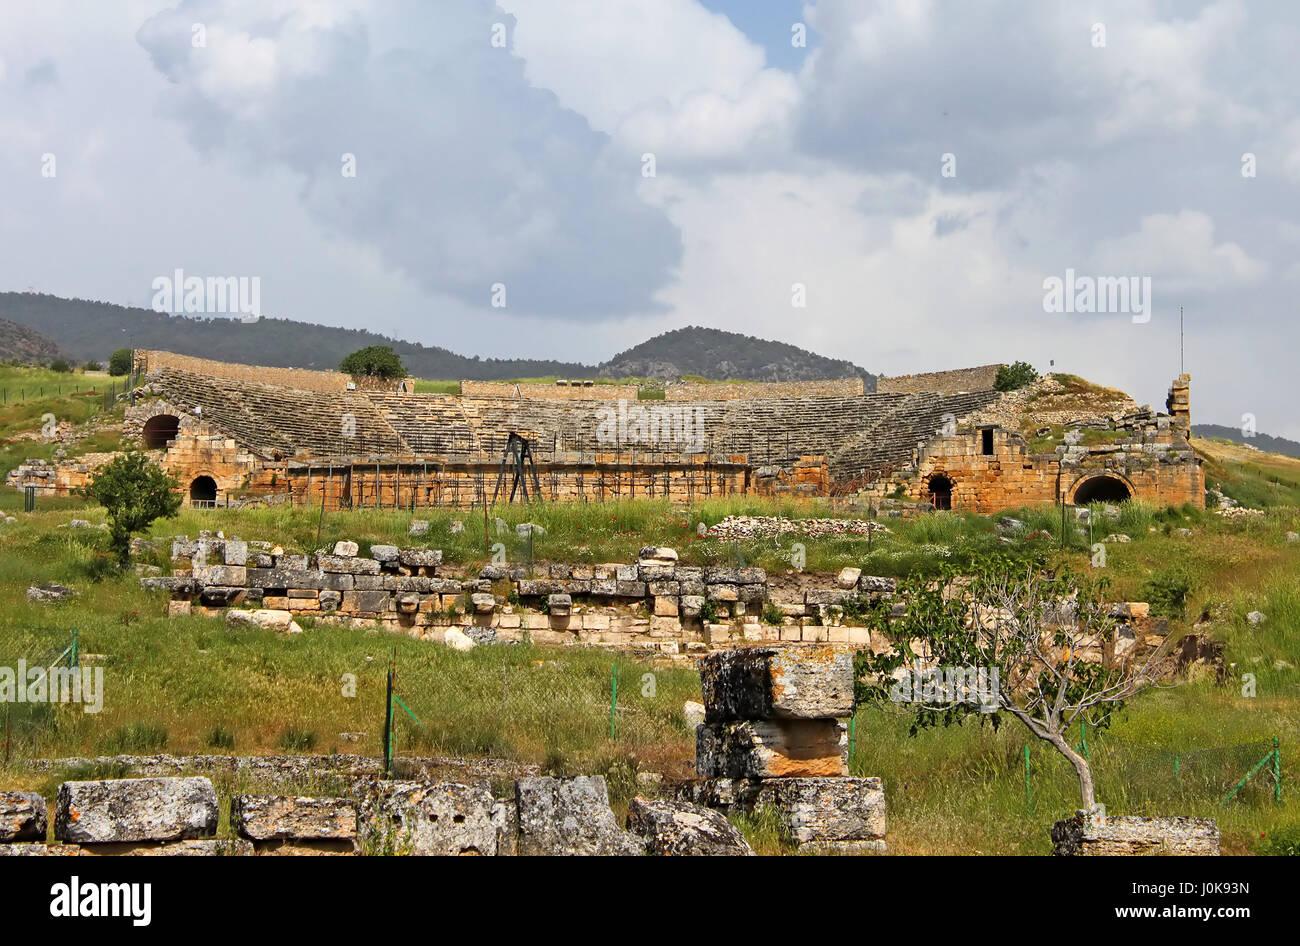 Ancient amphitheater near Pamukkale in Hierapolis, Turkey - Stock Image